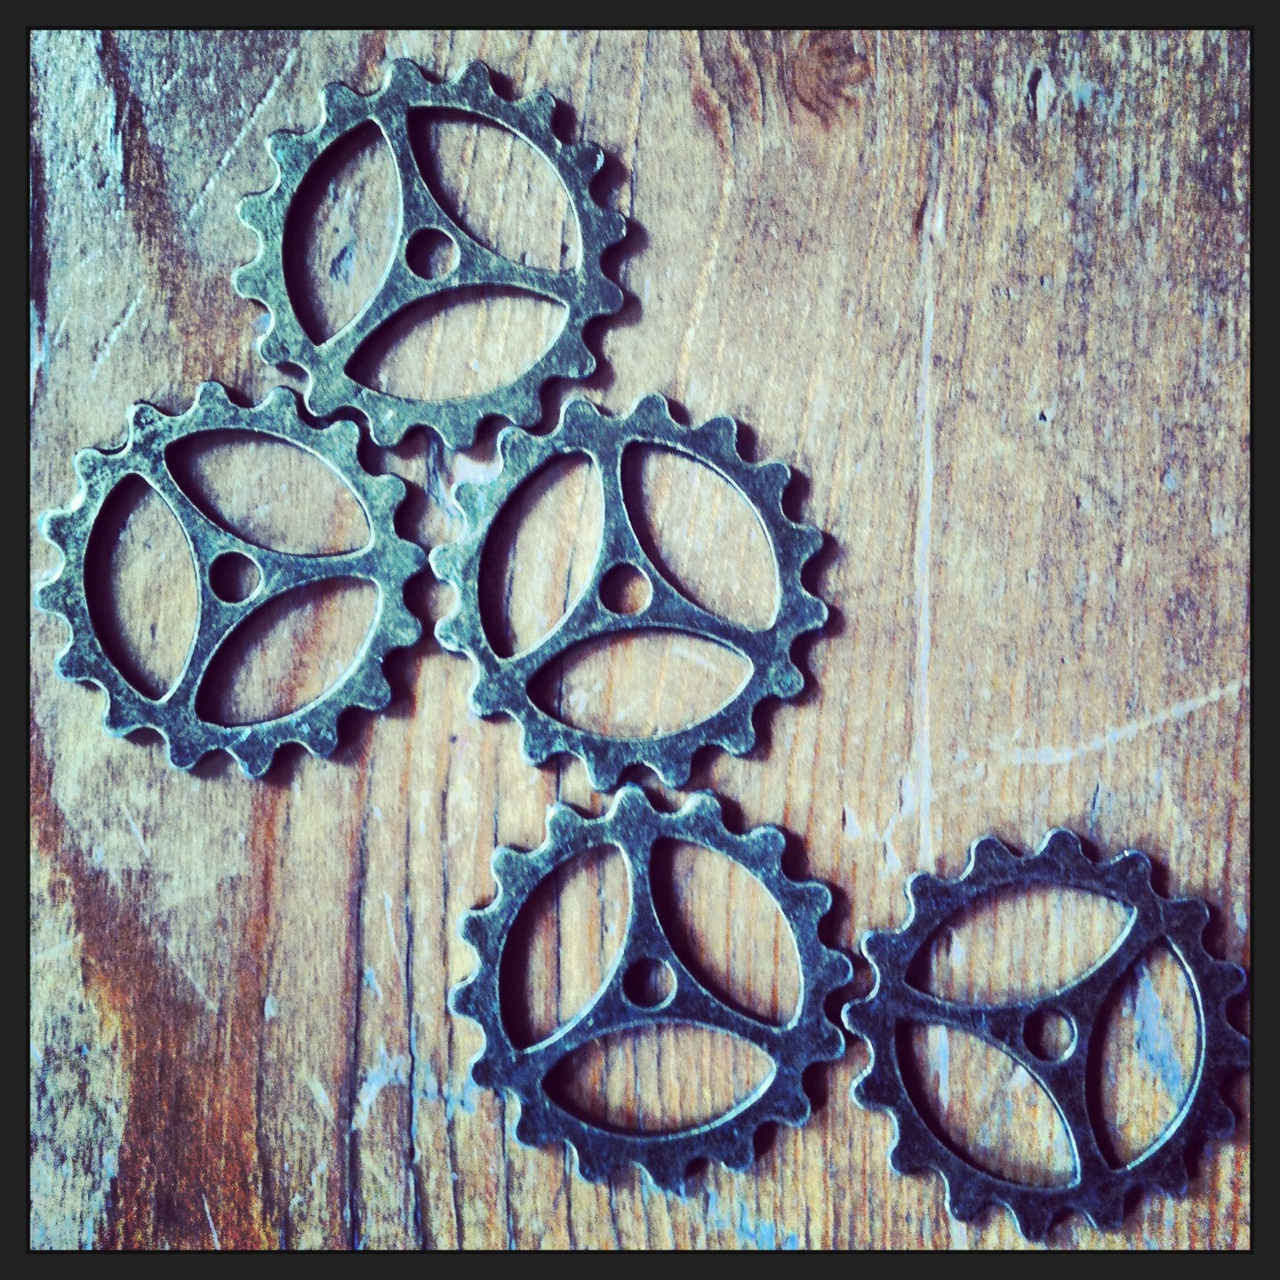 Steampunk cogs